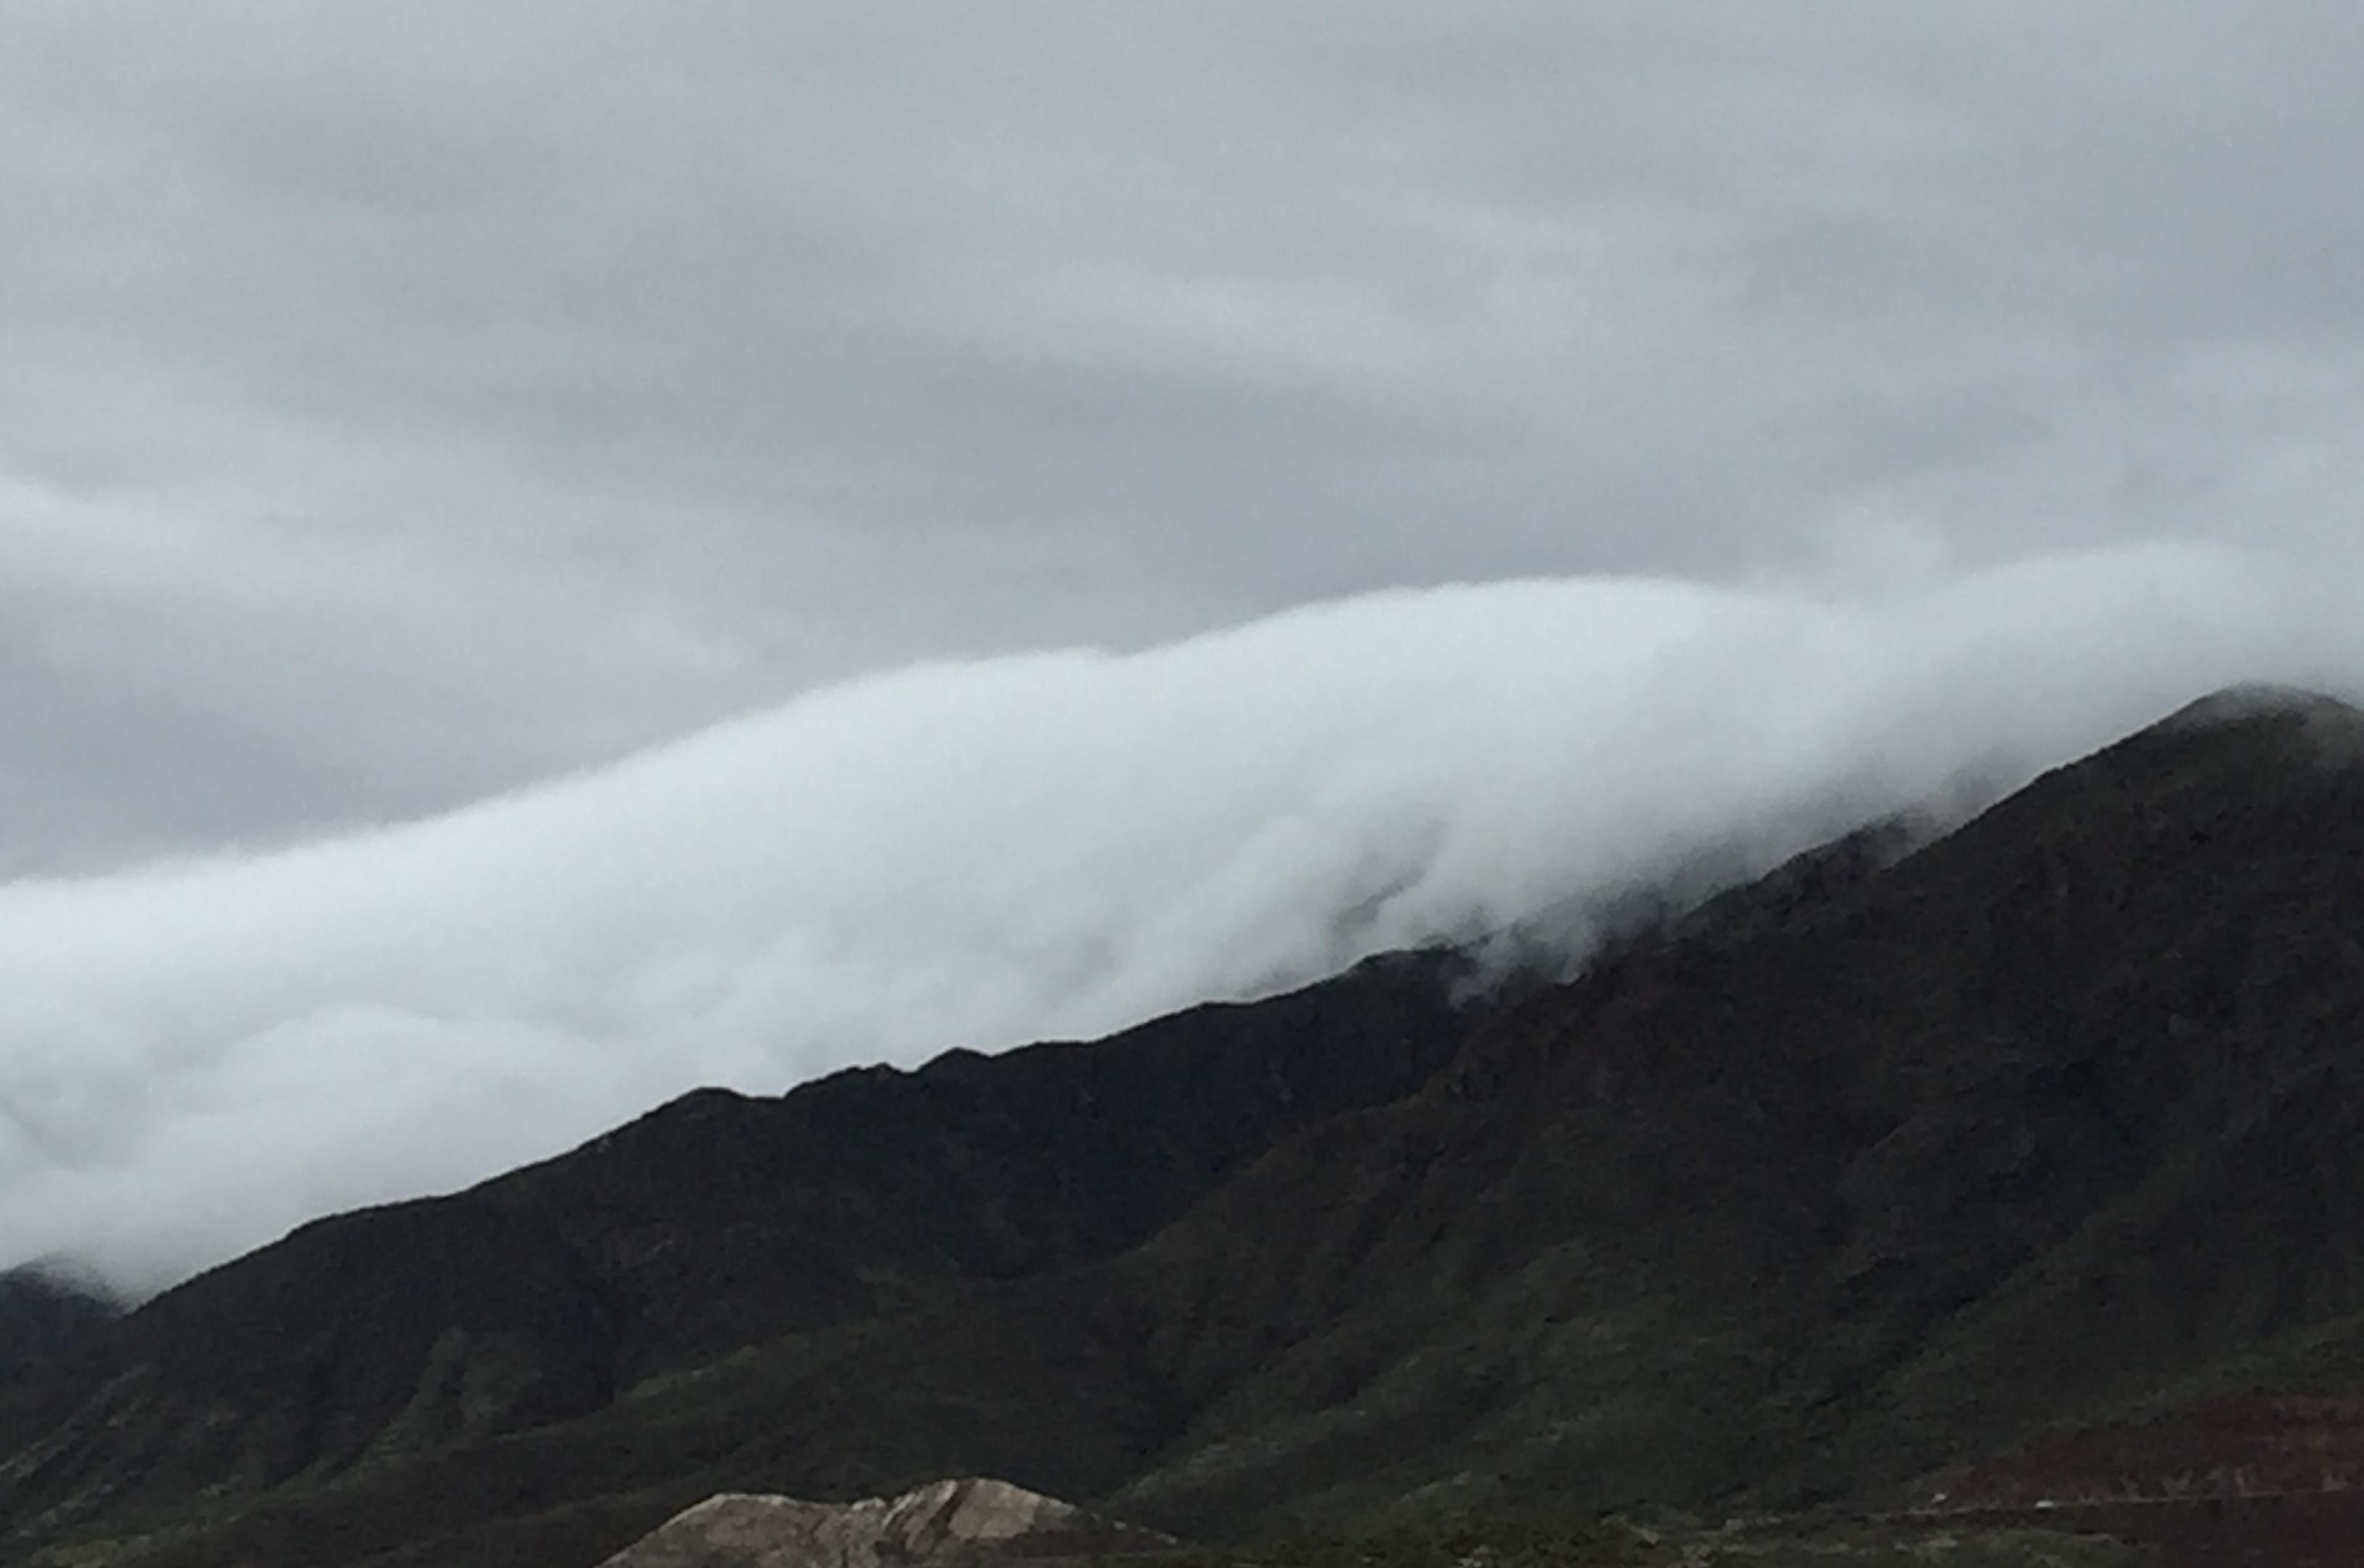 Franklin mountain on that rainy day.